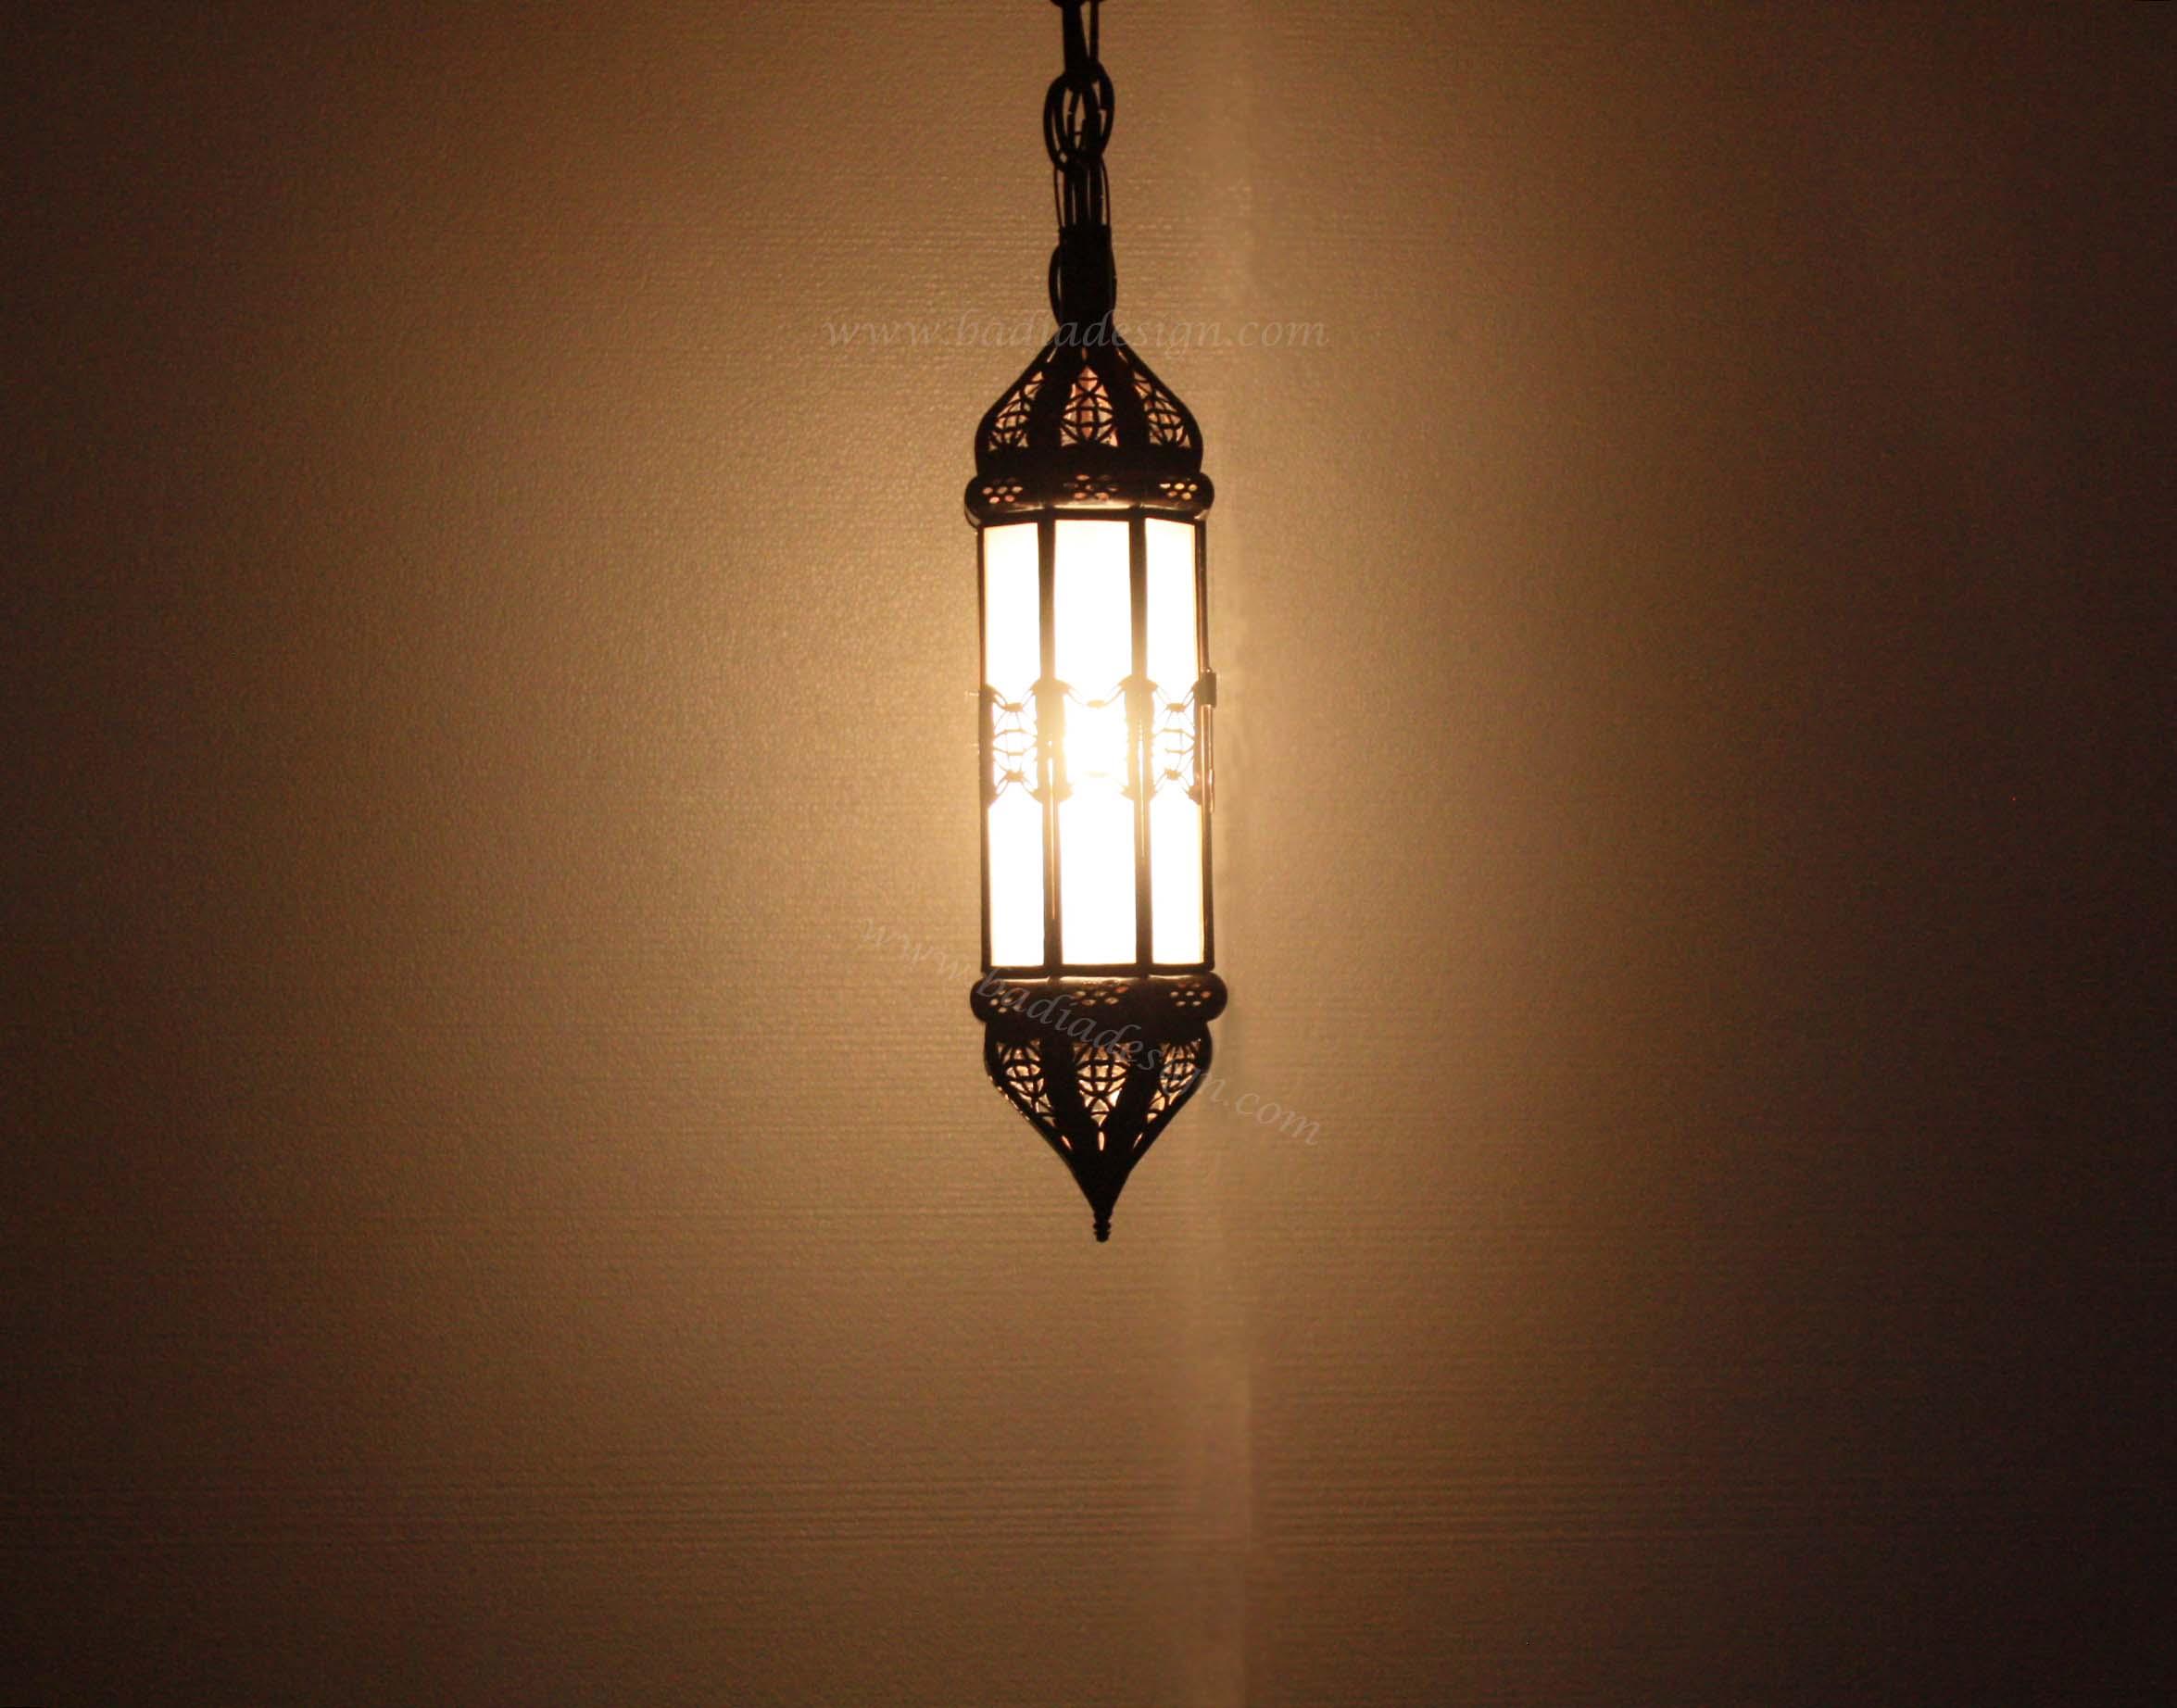 moroccan-lighting-san-francisco-lig178-1.jpg